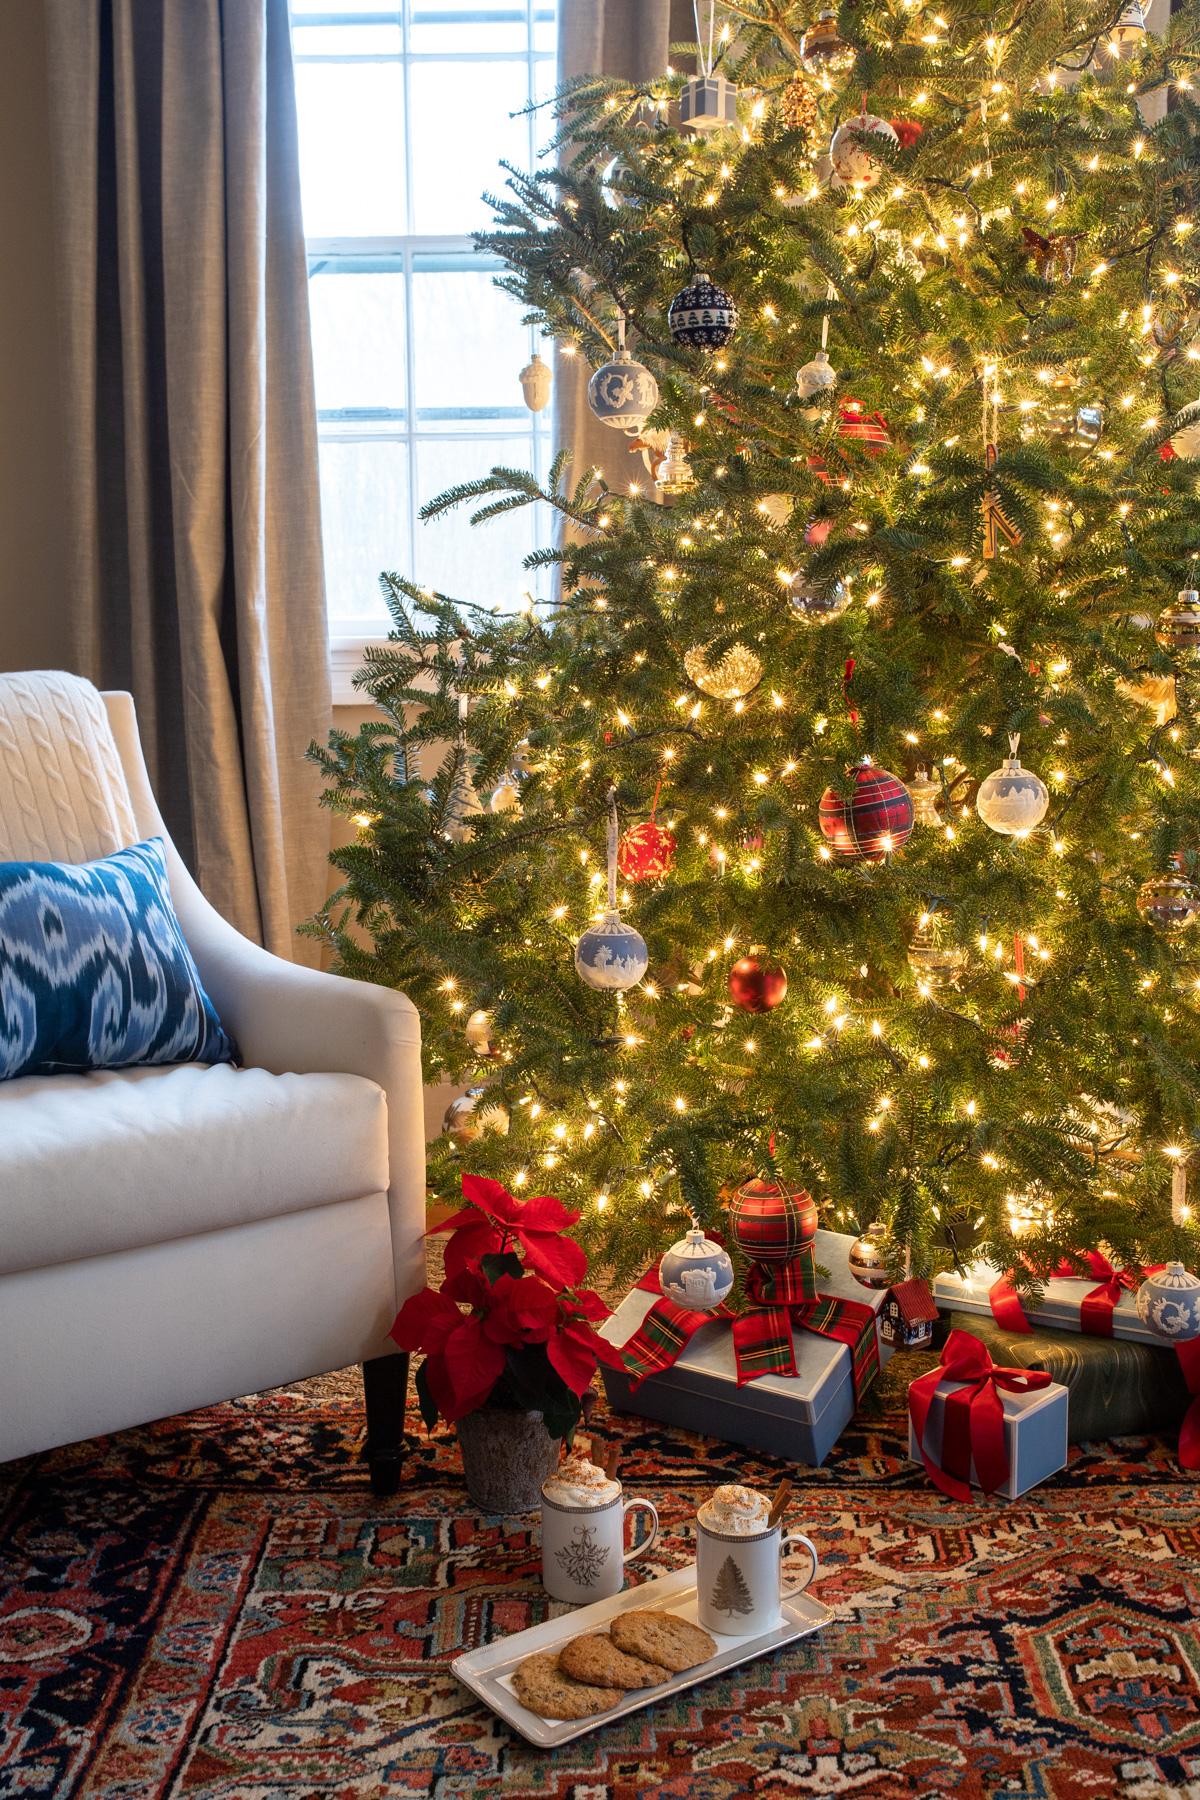 Stacie Flinner x New England Holiday Decorations-16.jpg